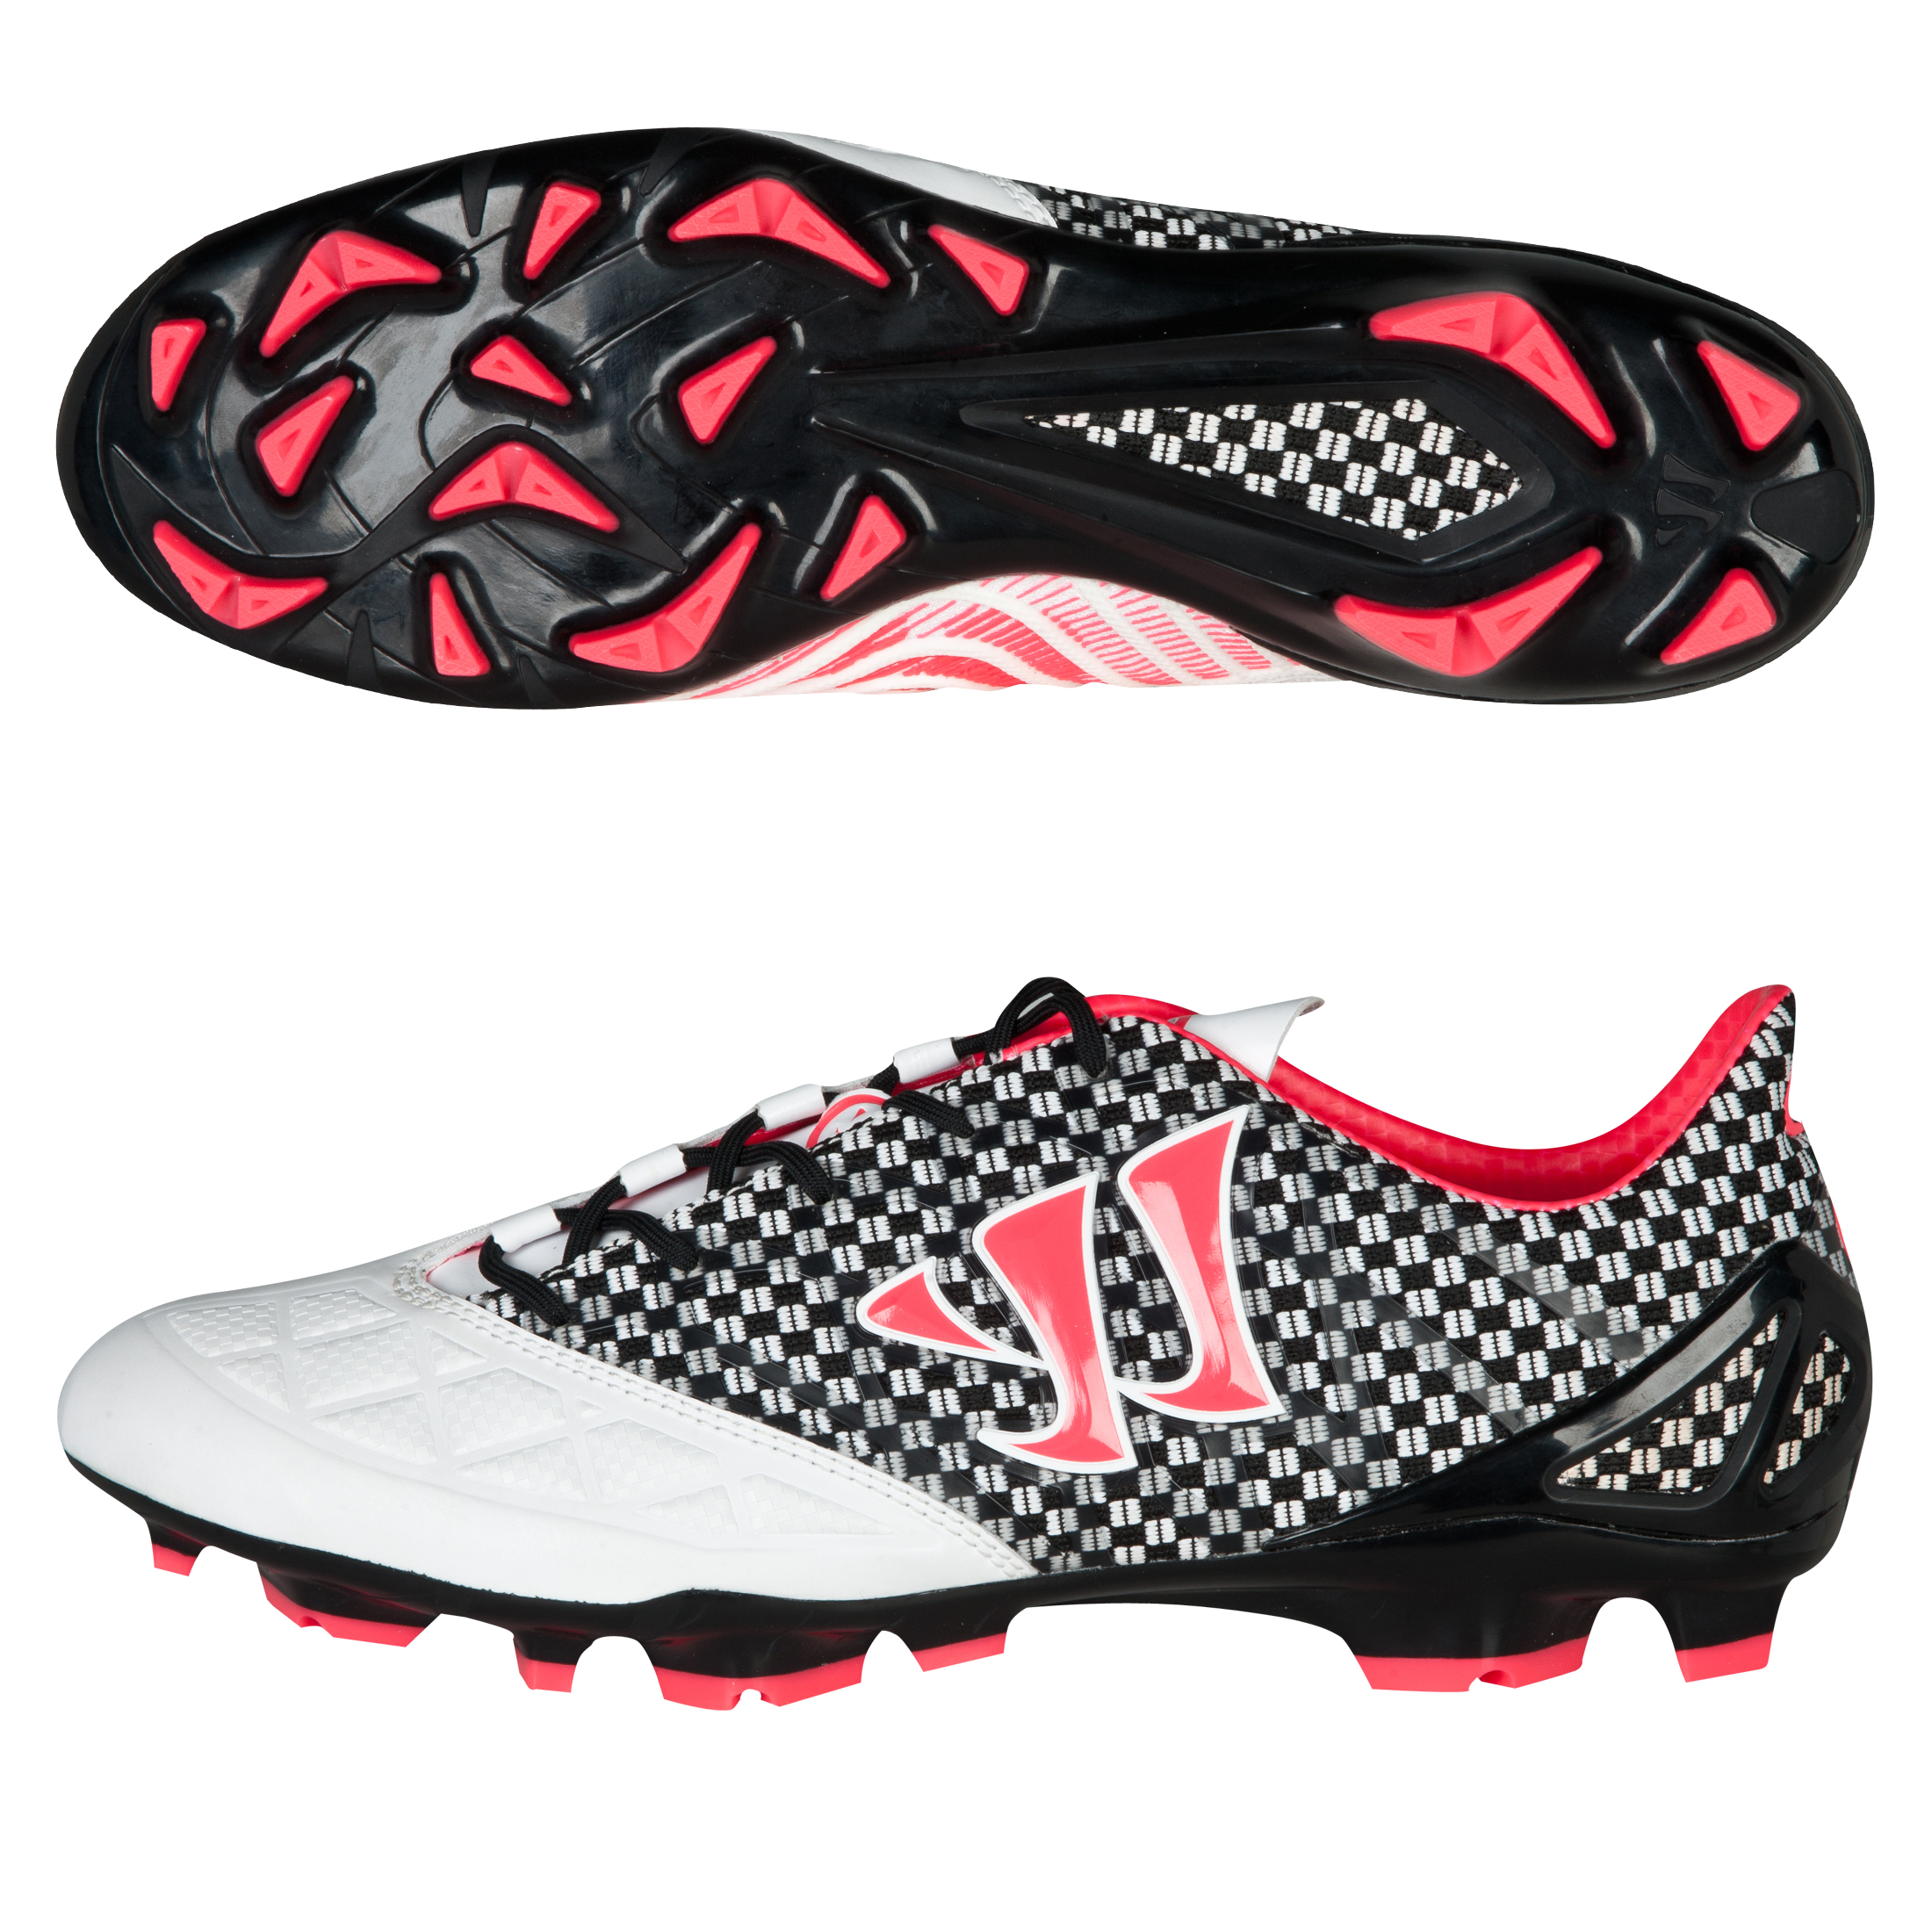 Warrior Sports Gambler S-Lite Firm Ground Football Boots- Whi/Blk/Pink White